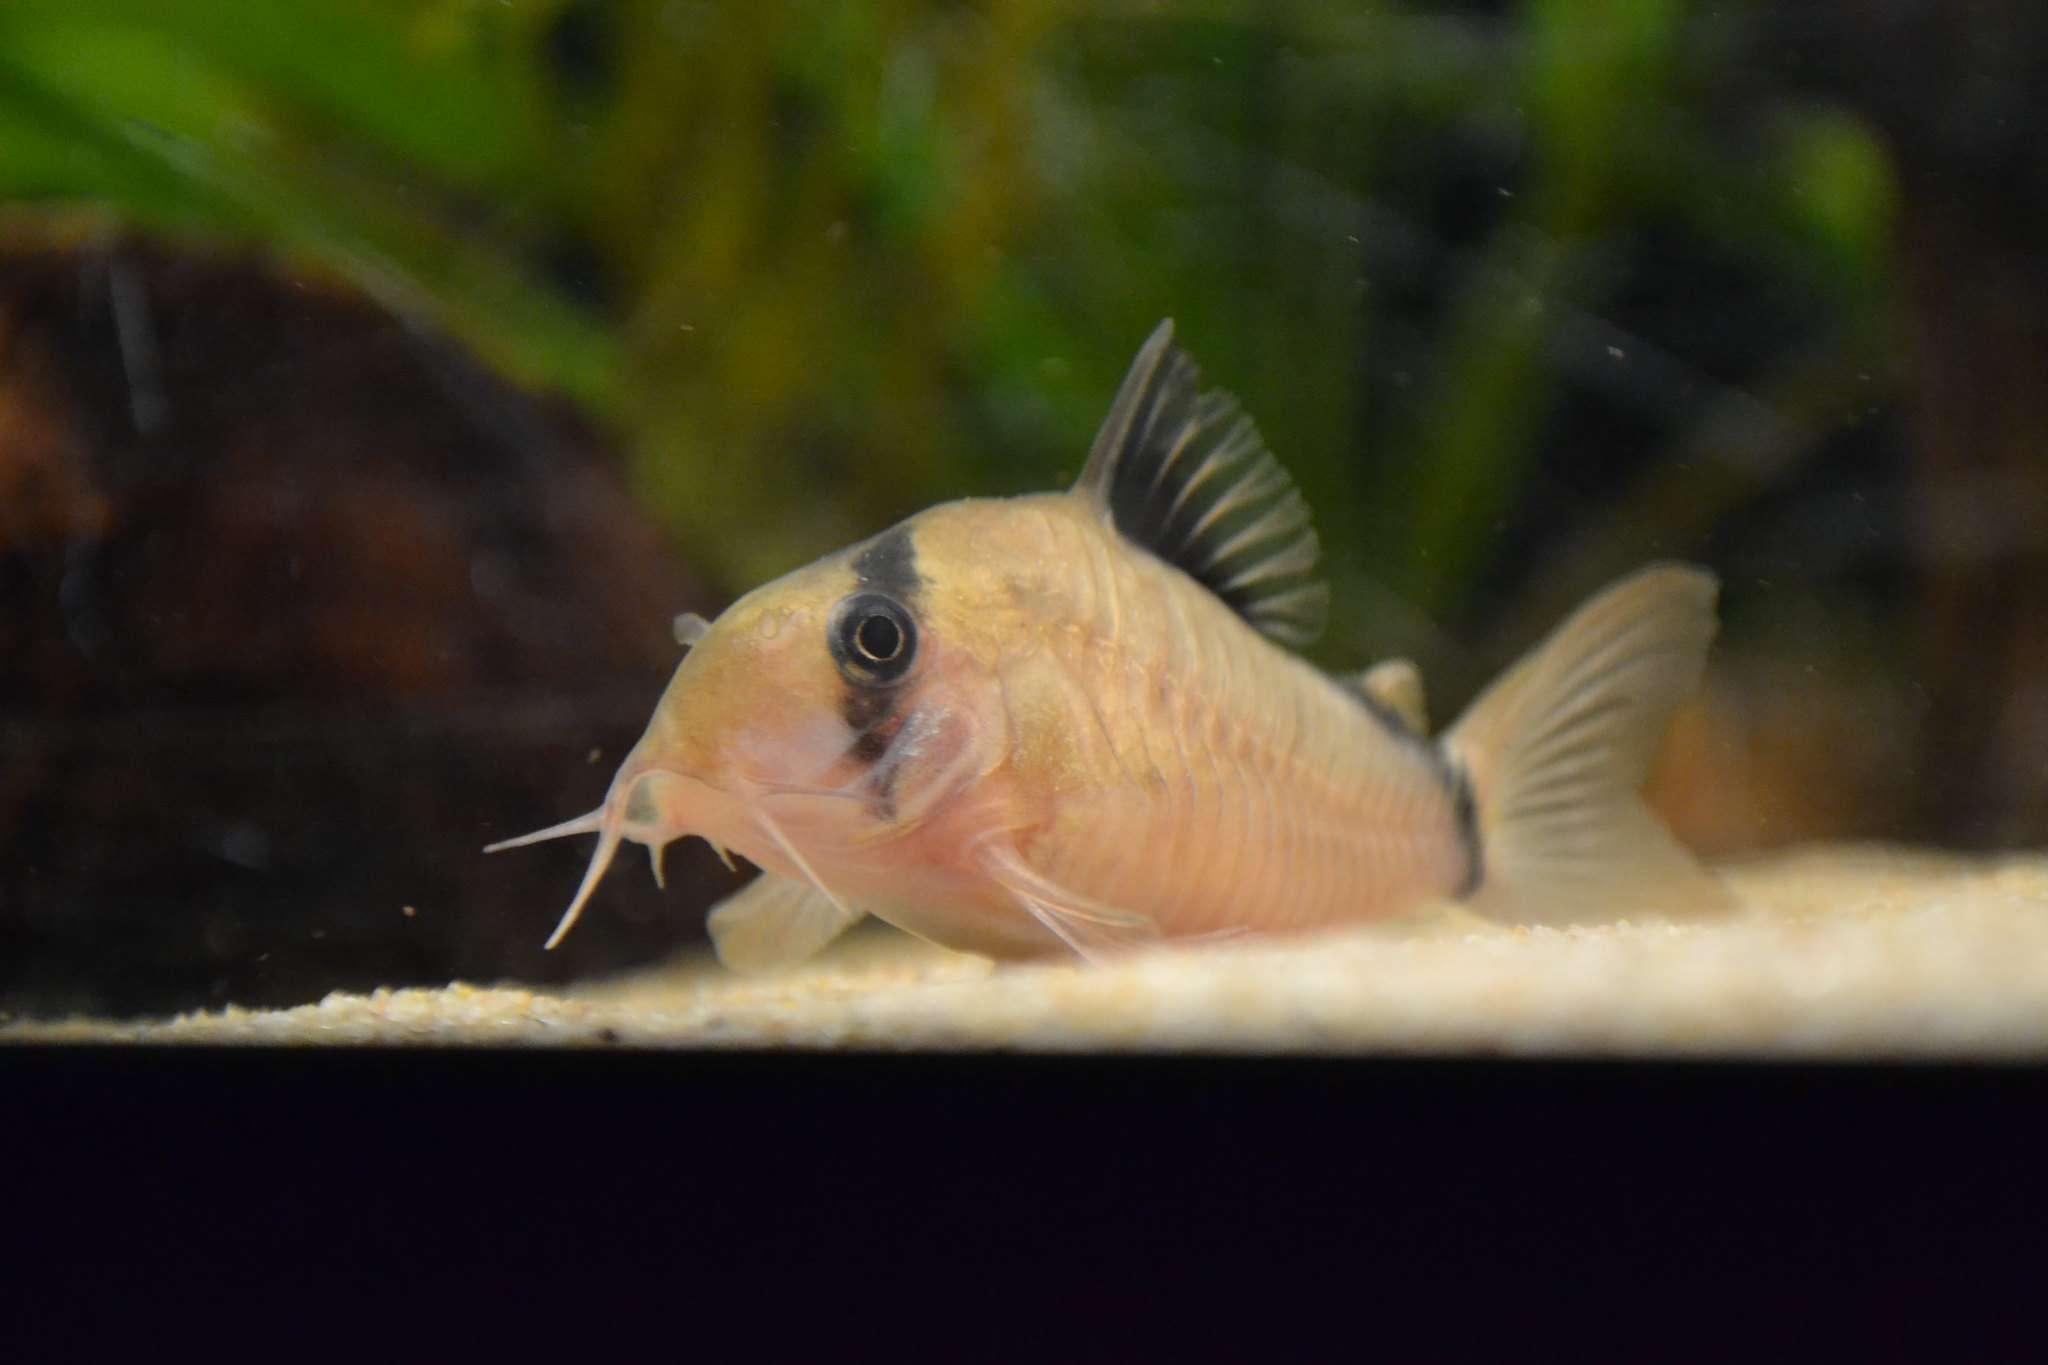 Bandit corydora resting on aquarium substrate